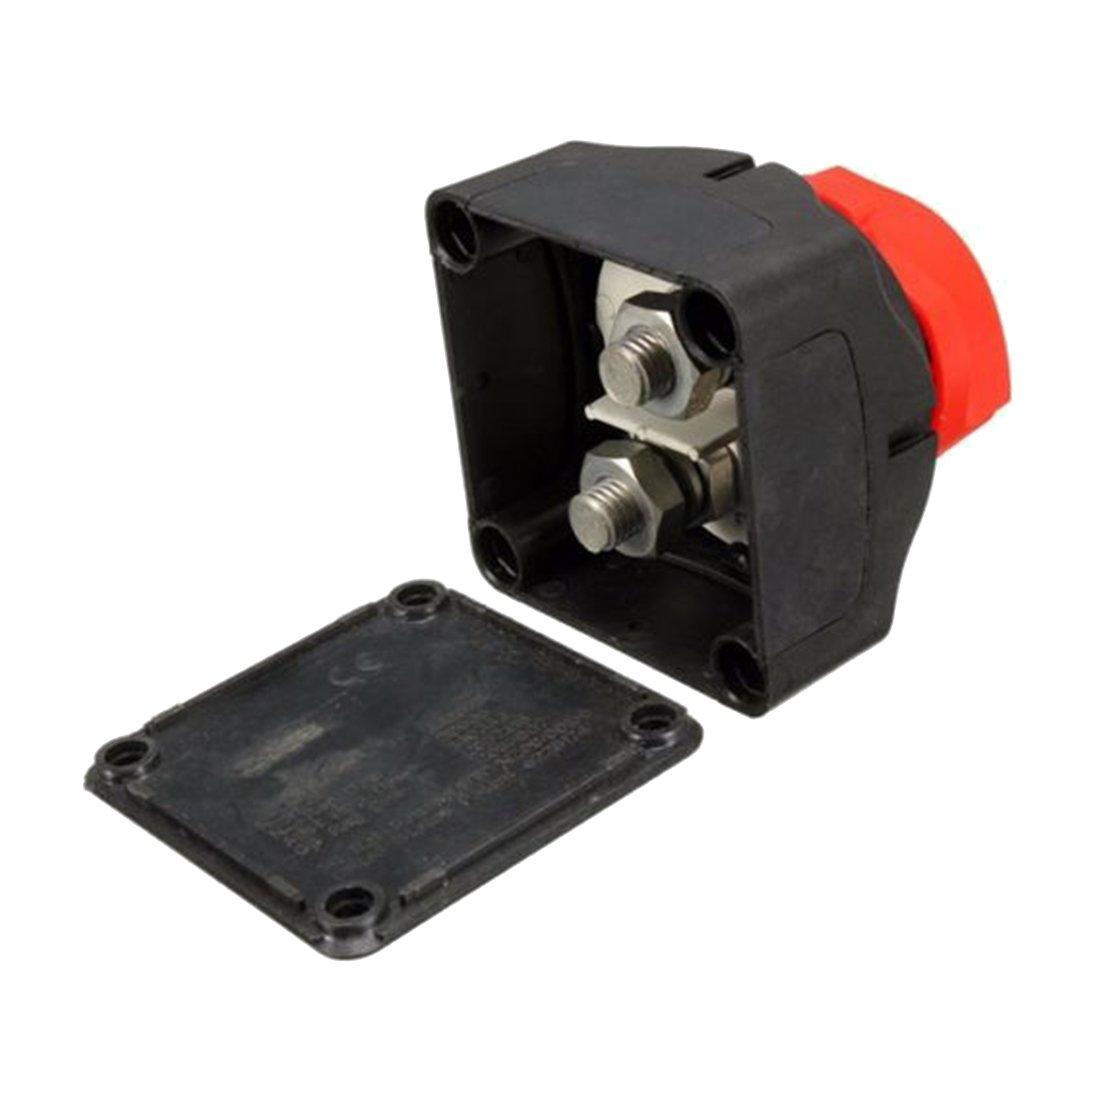 Semoic Removable Knob Marine Battery Isolator Cut Off Kill Switch Boat 12V//24V//48V